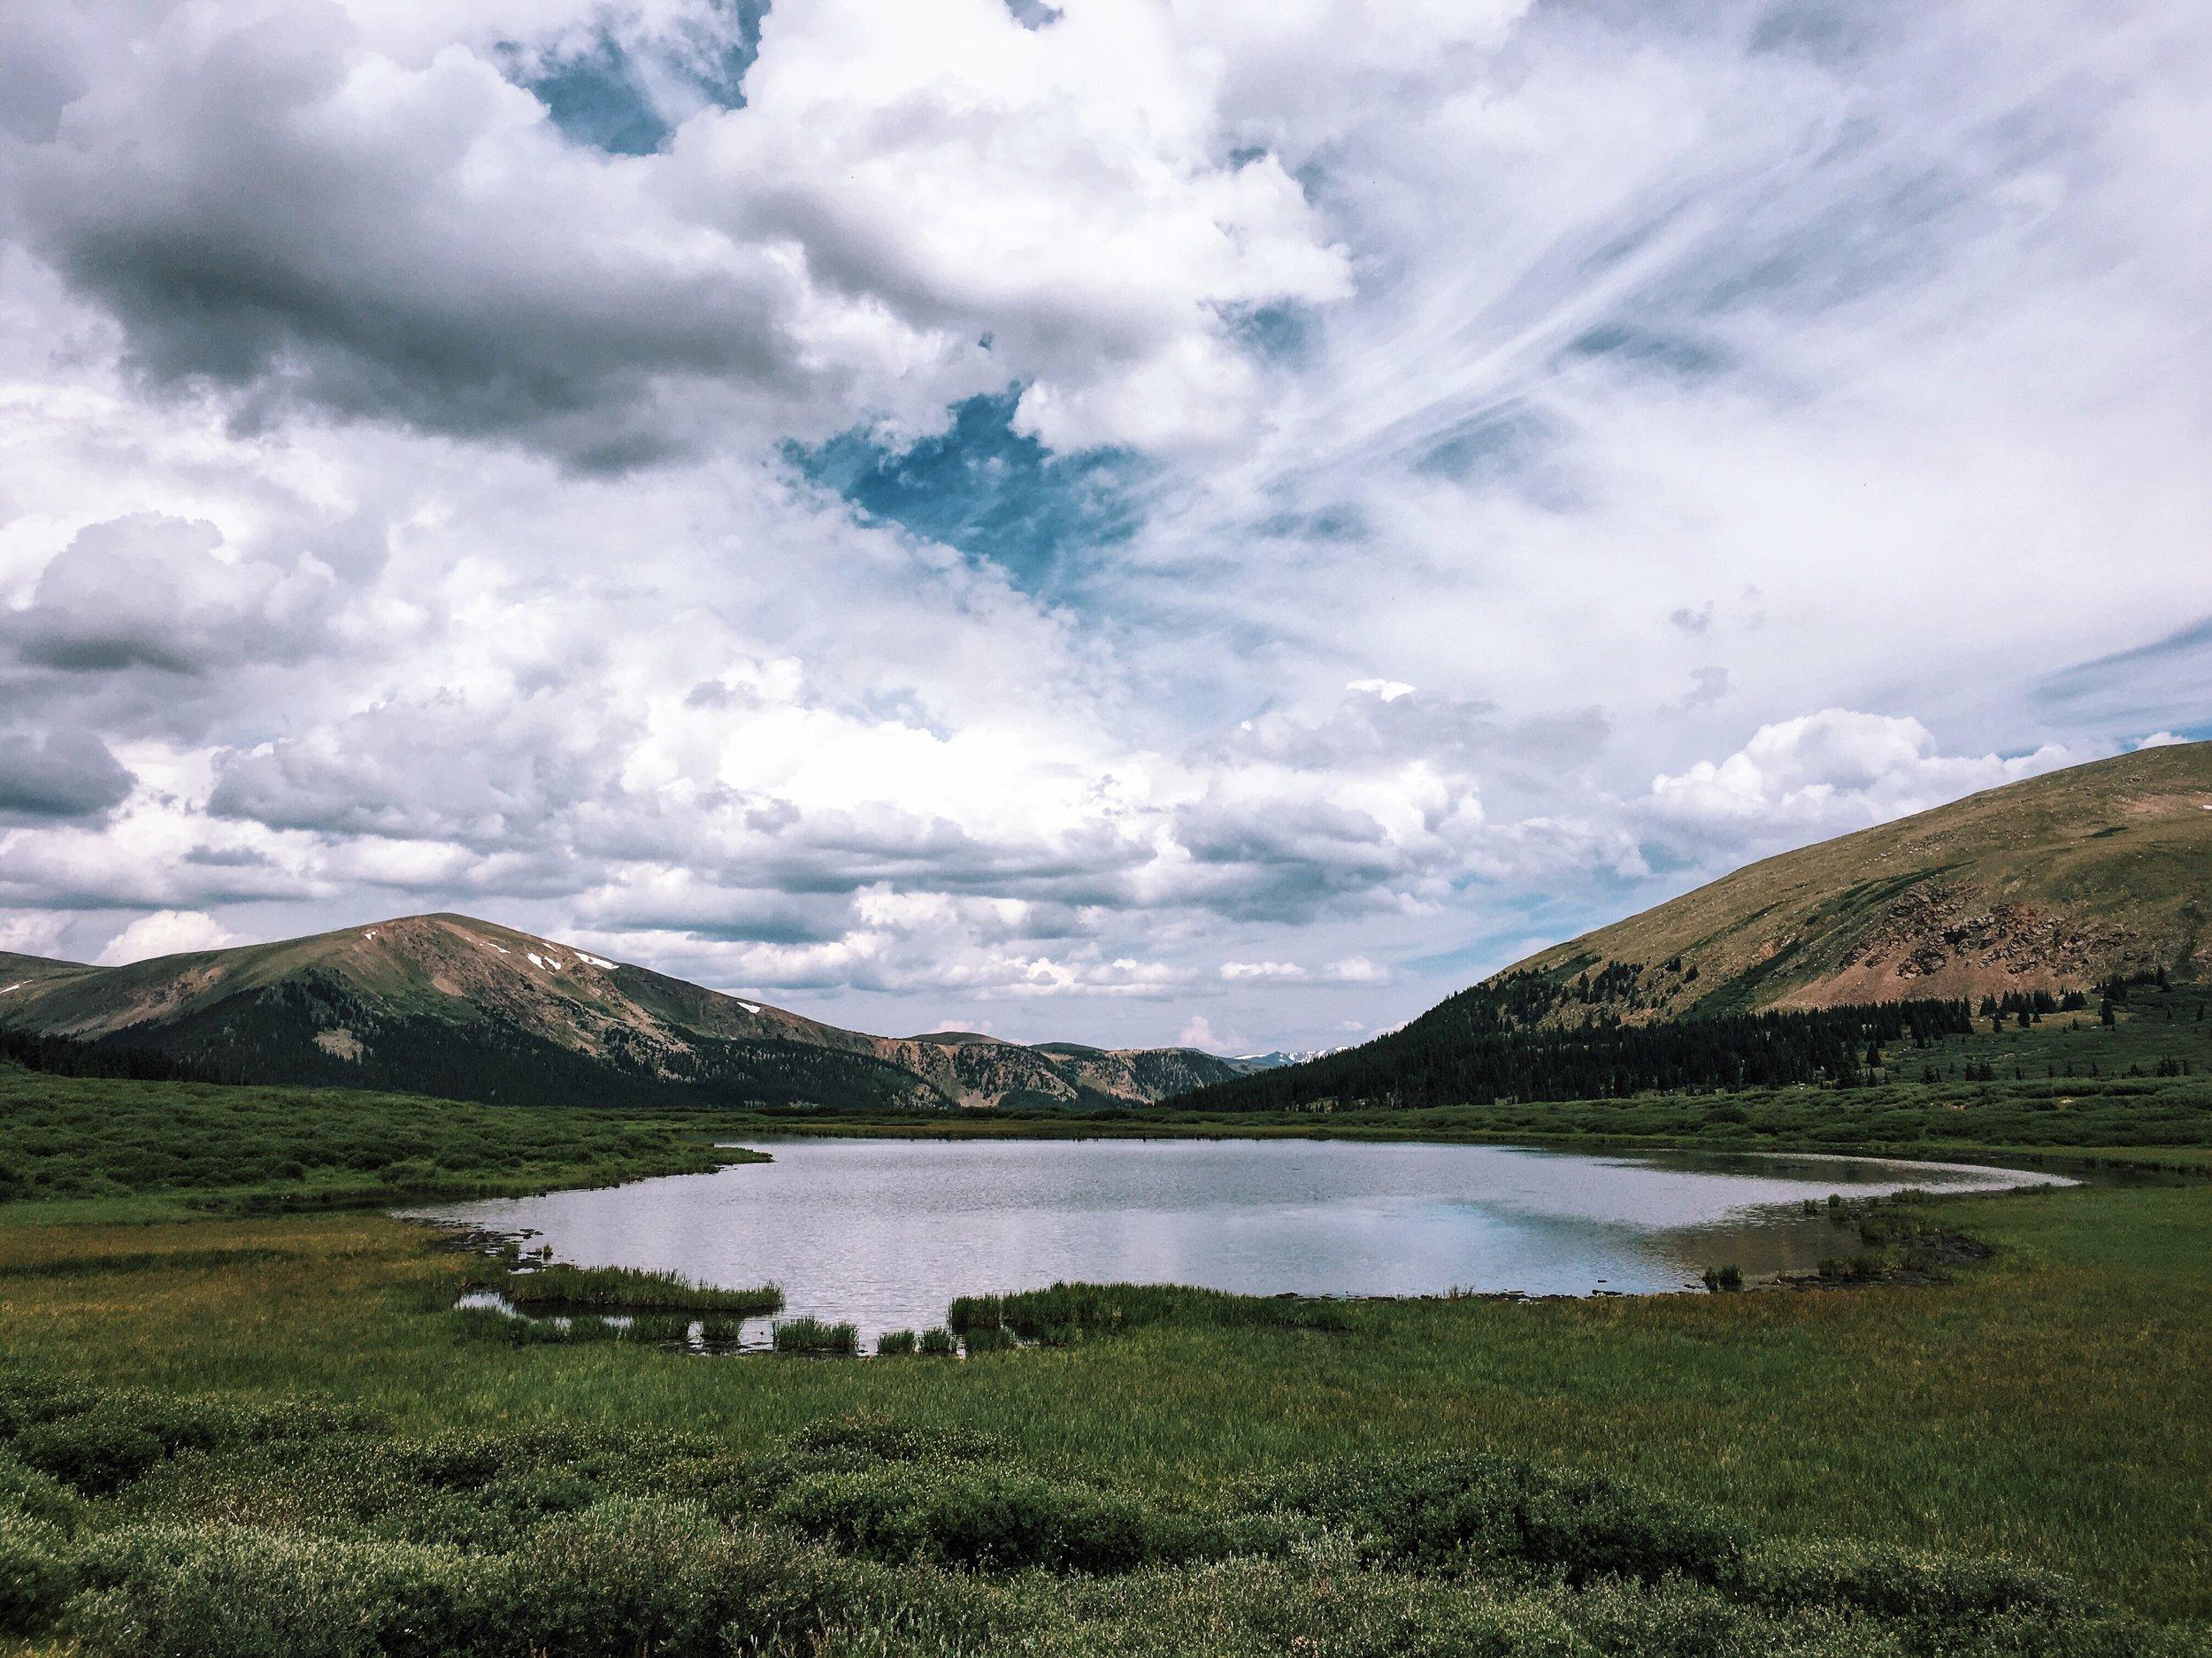 Mt. Bierstadt, Colorado